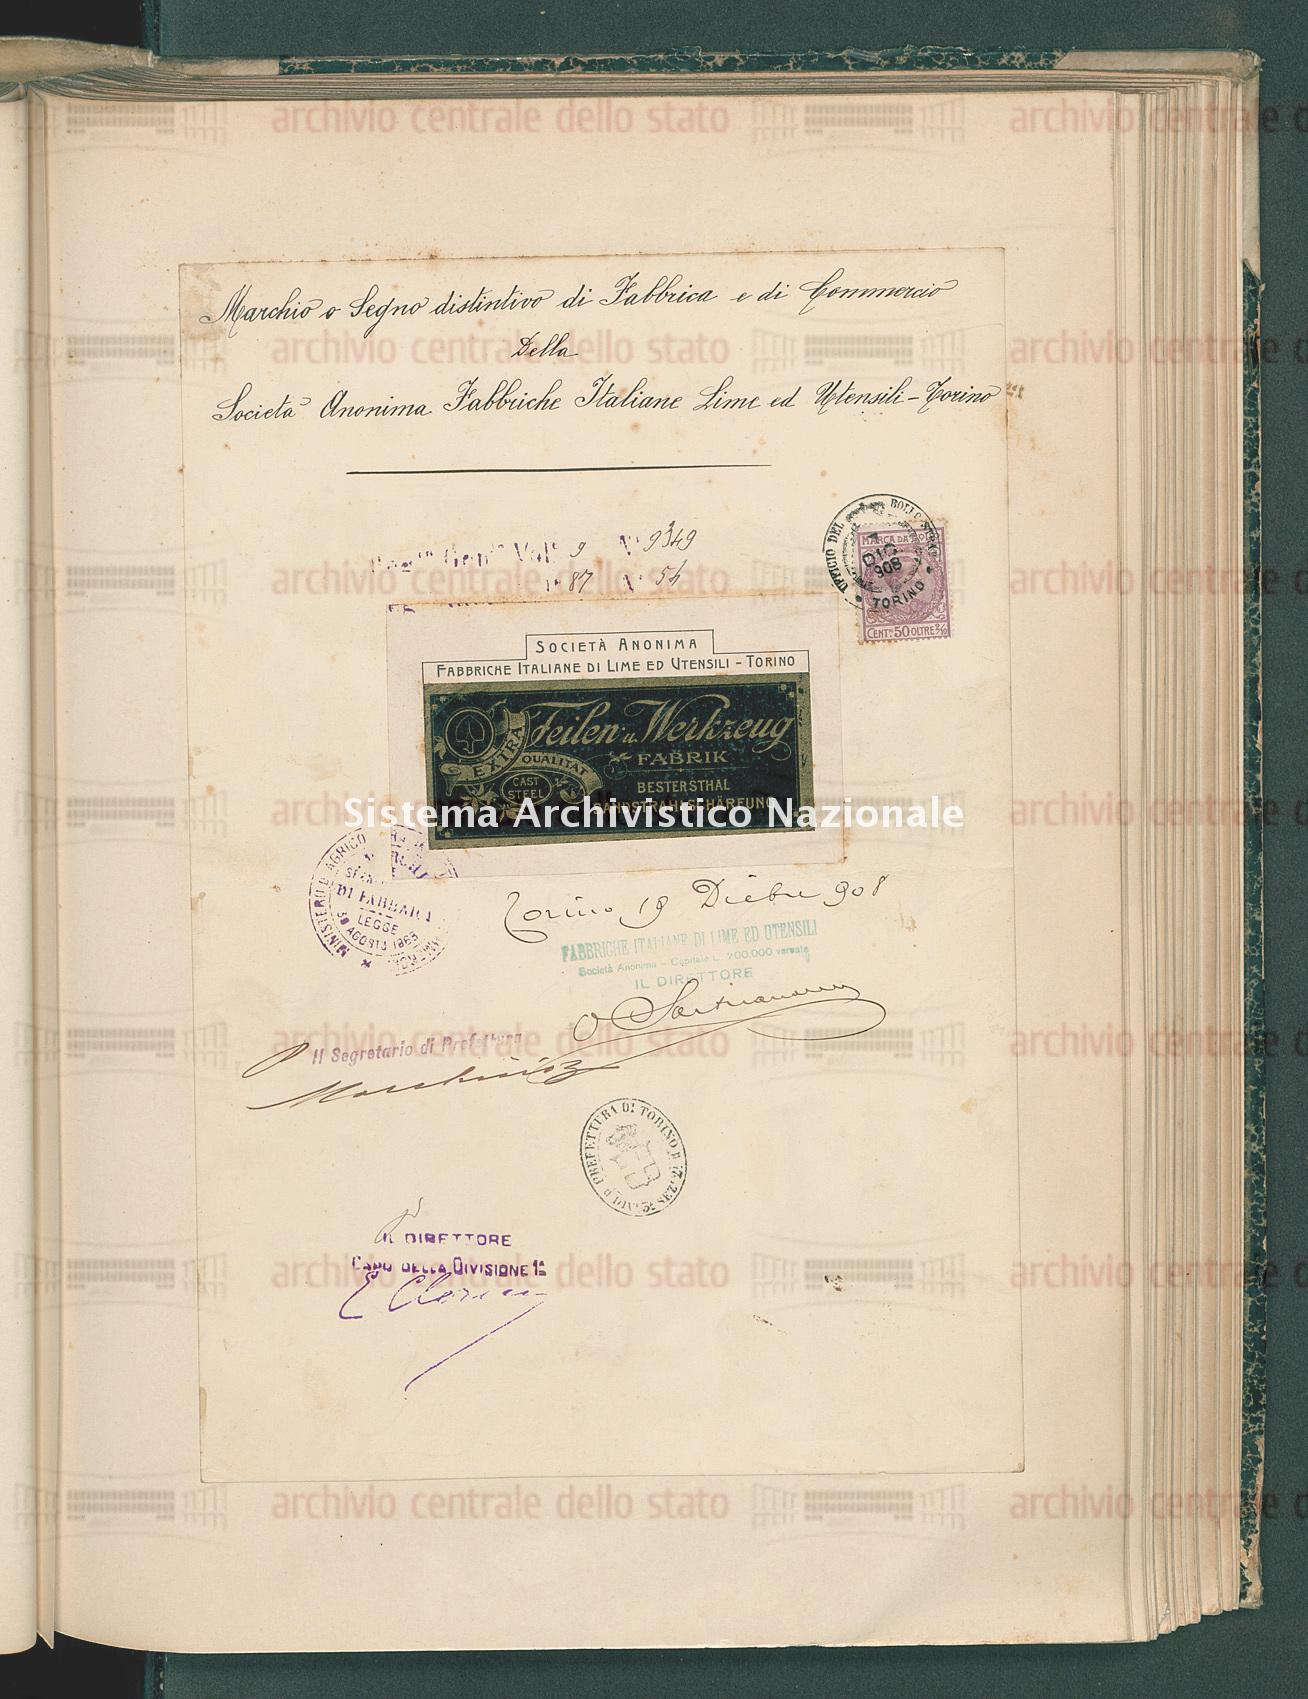 Societa' Anonima Fabbriche Italiane Lime Ed Utensili (27/05/1909)